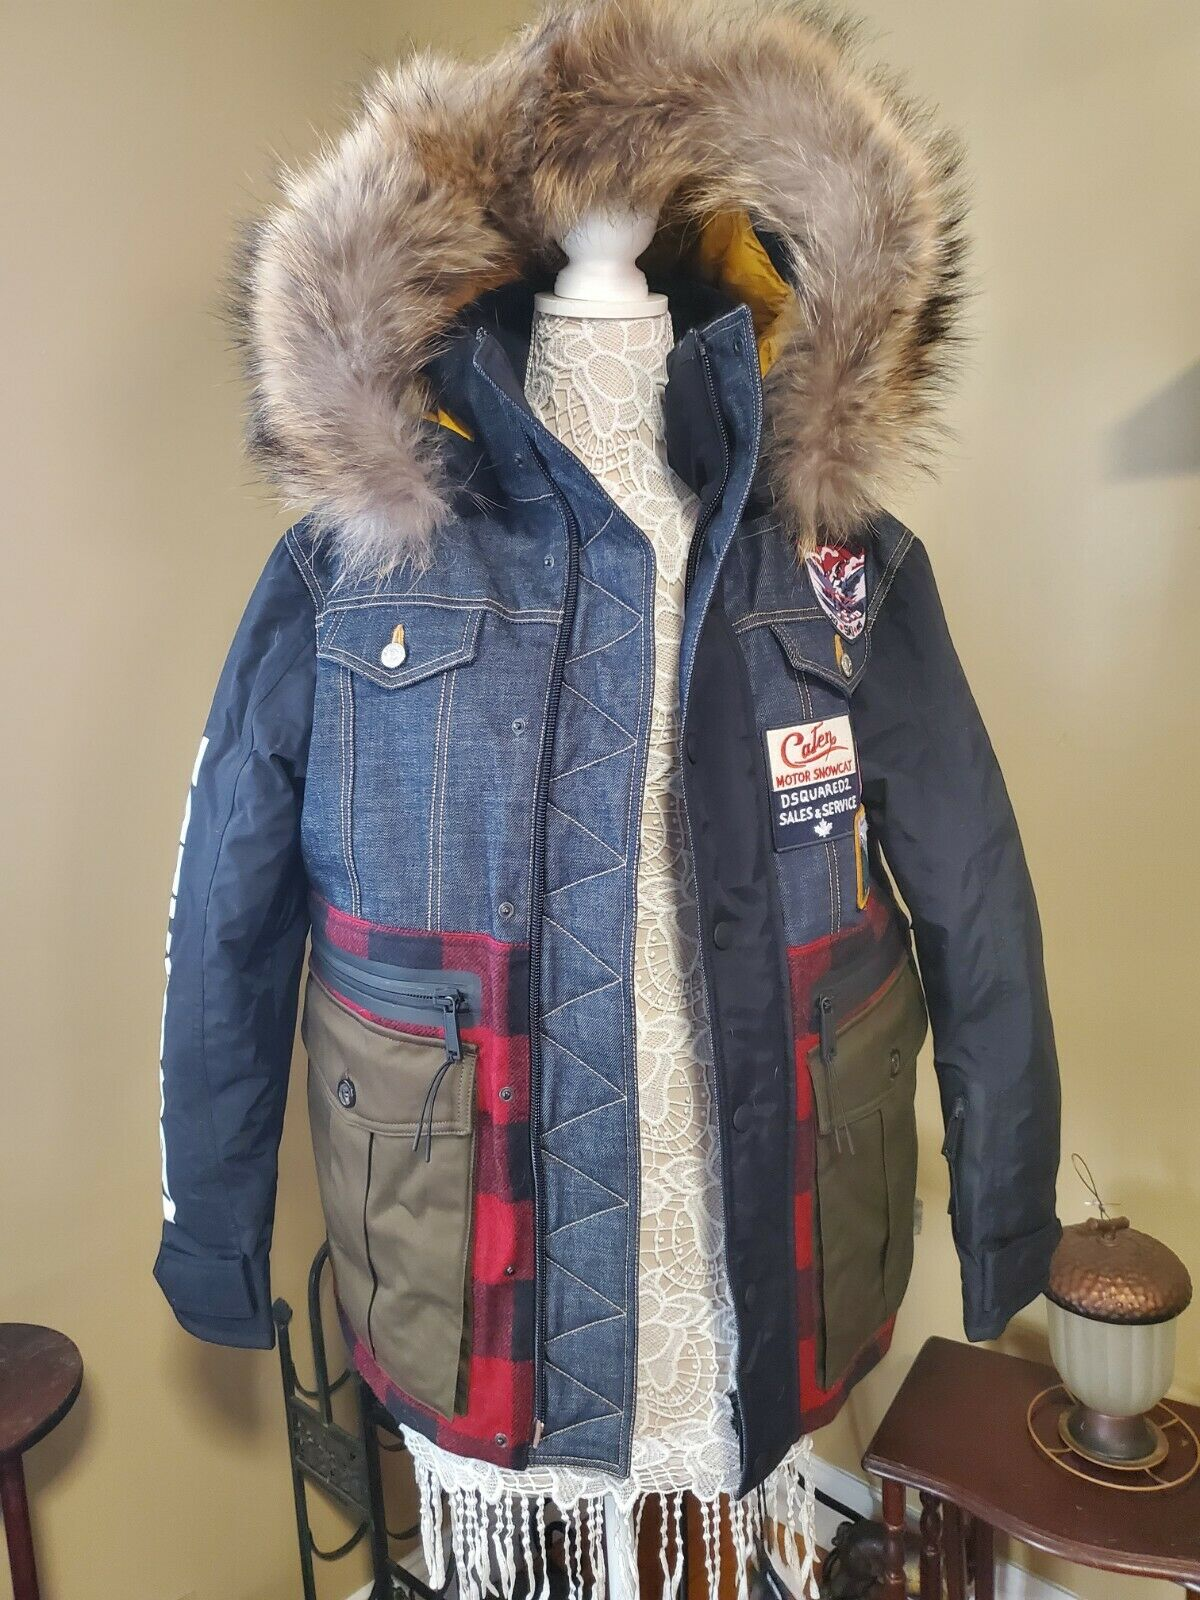 dsquared2 logo patch ski coat bnwt size 44 mens (size 46-48 womens)